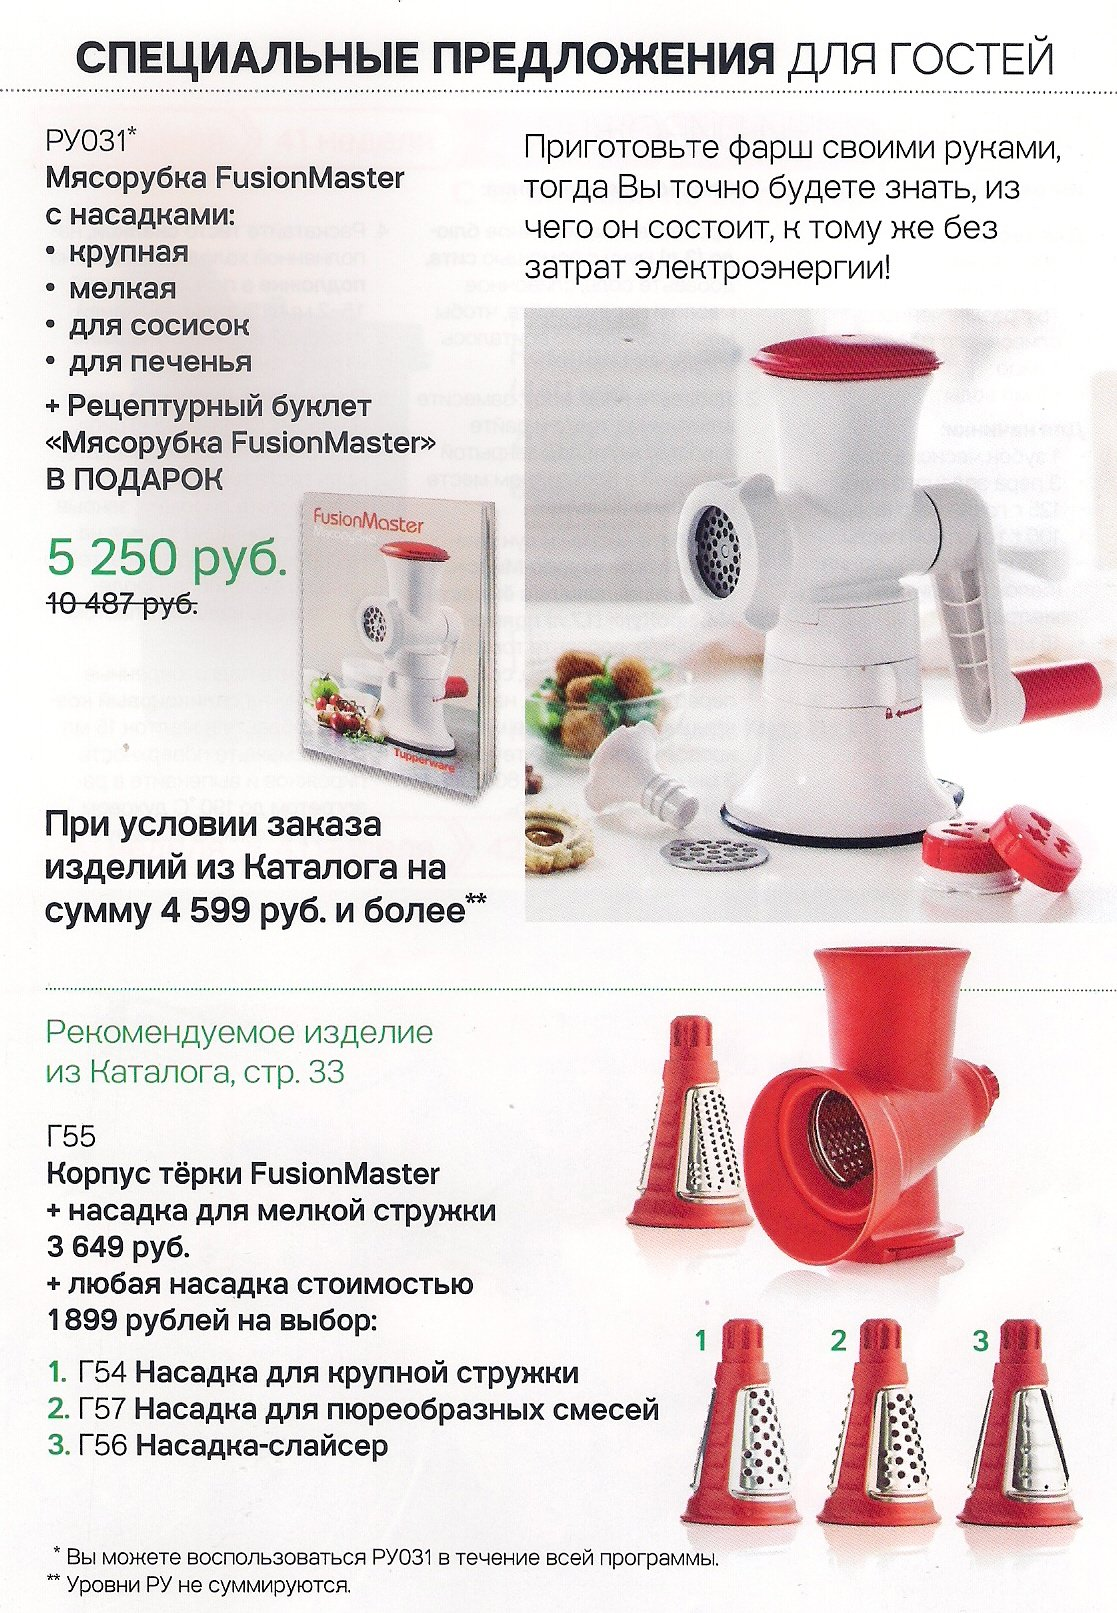 http://tupperware-online.ru/images/upload/18d.jpg